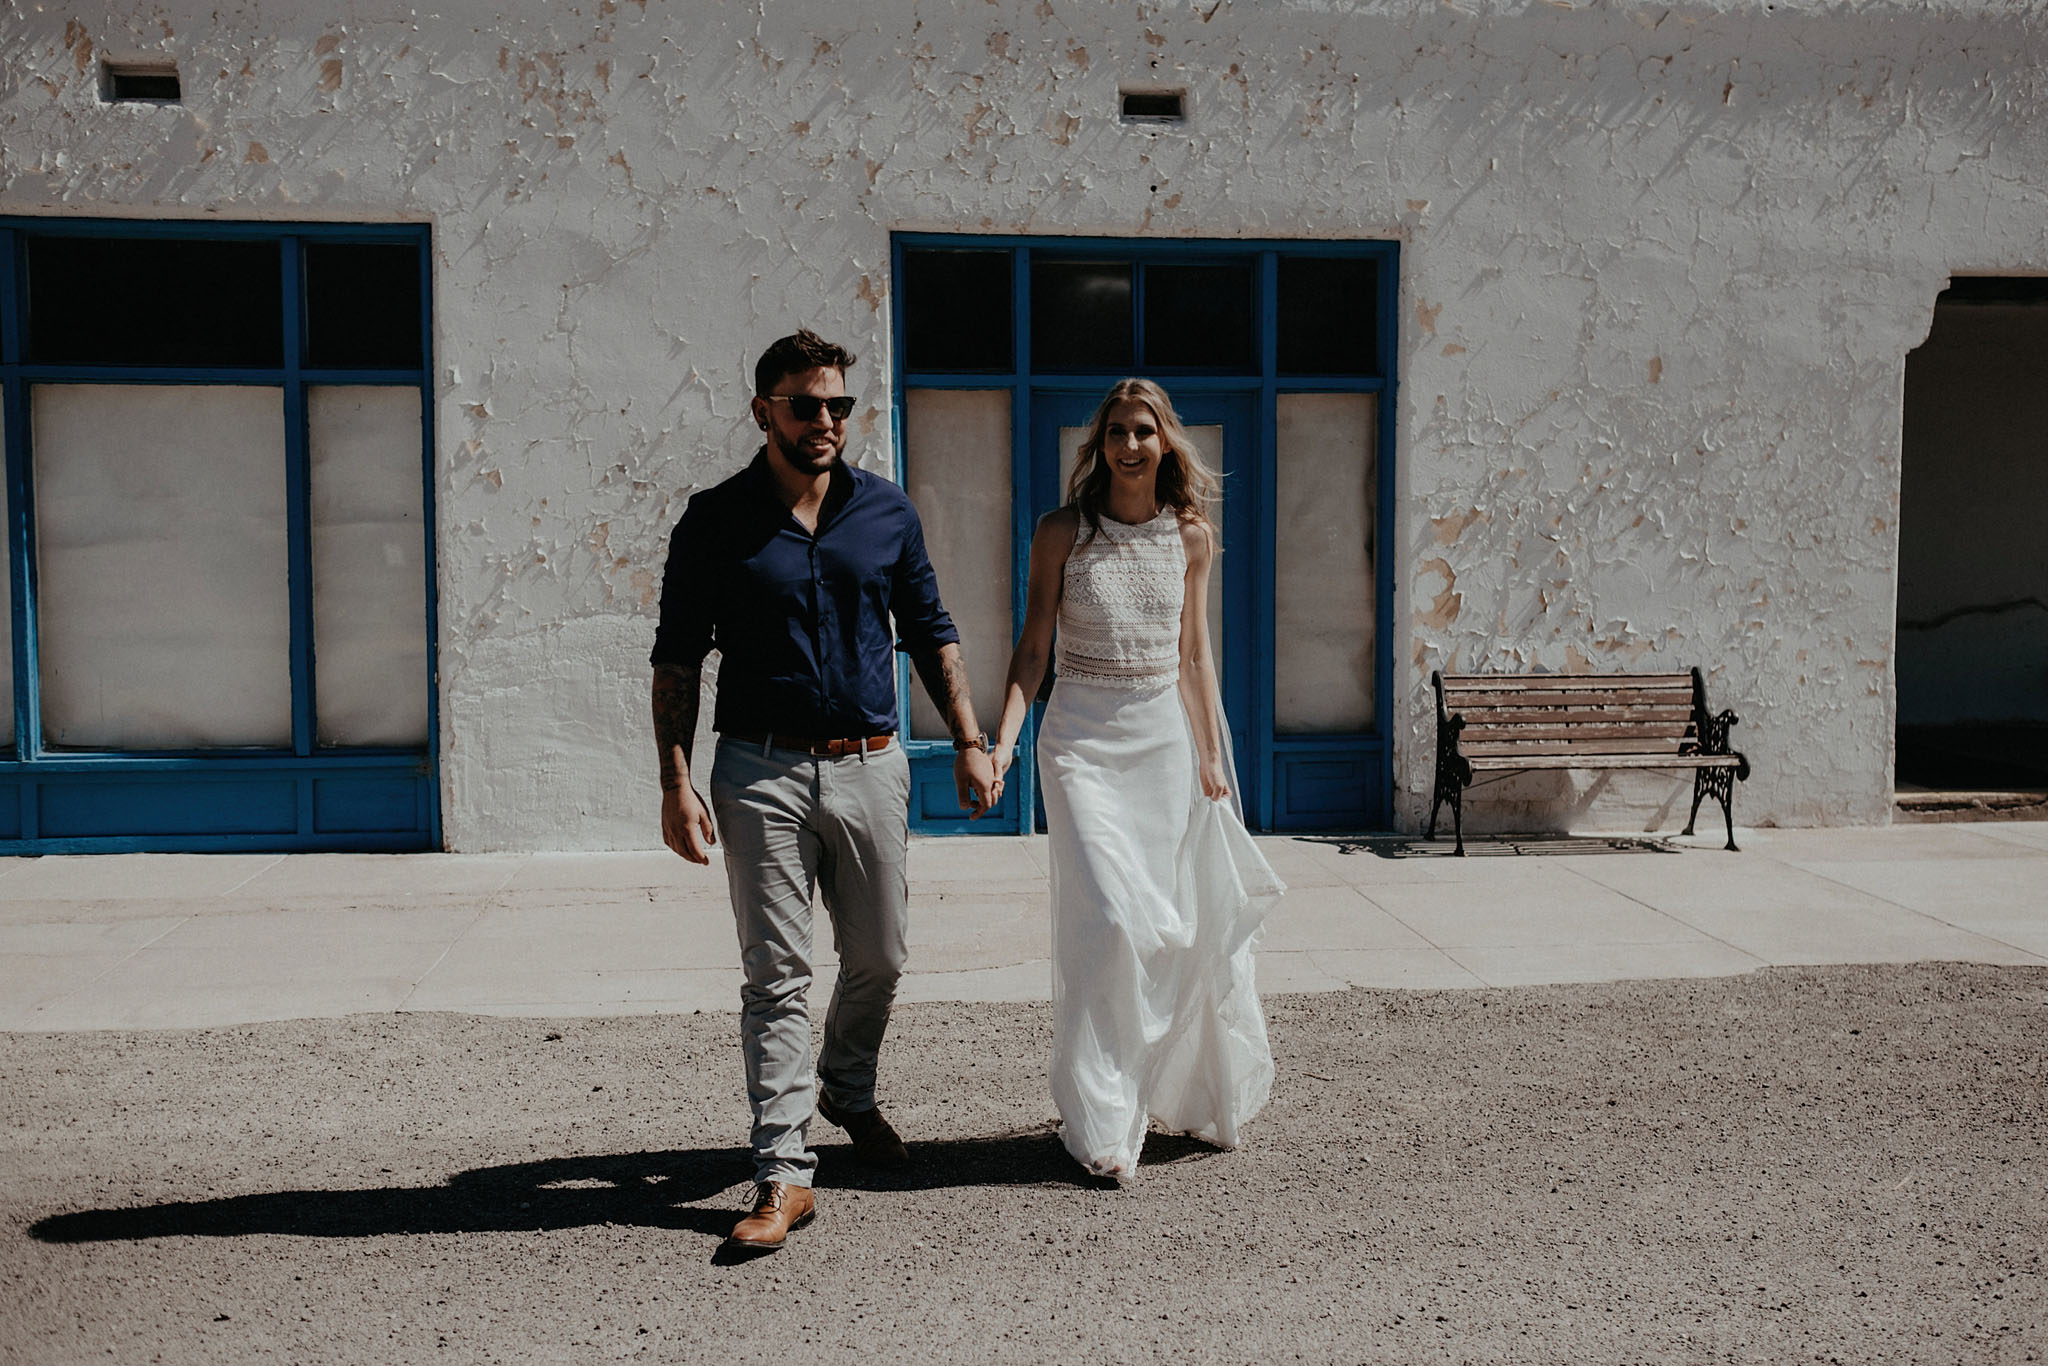 death valley adventure elopement wedding photographer national park desert couple portrait